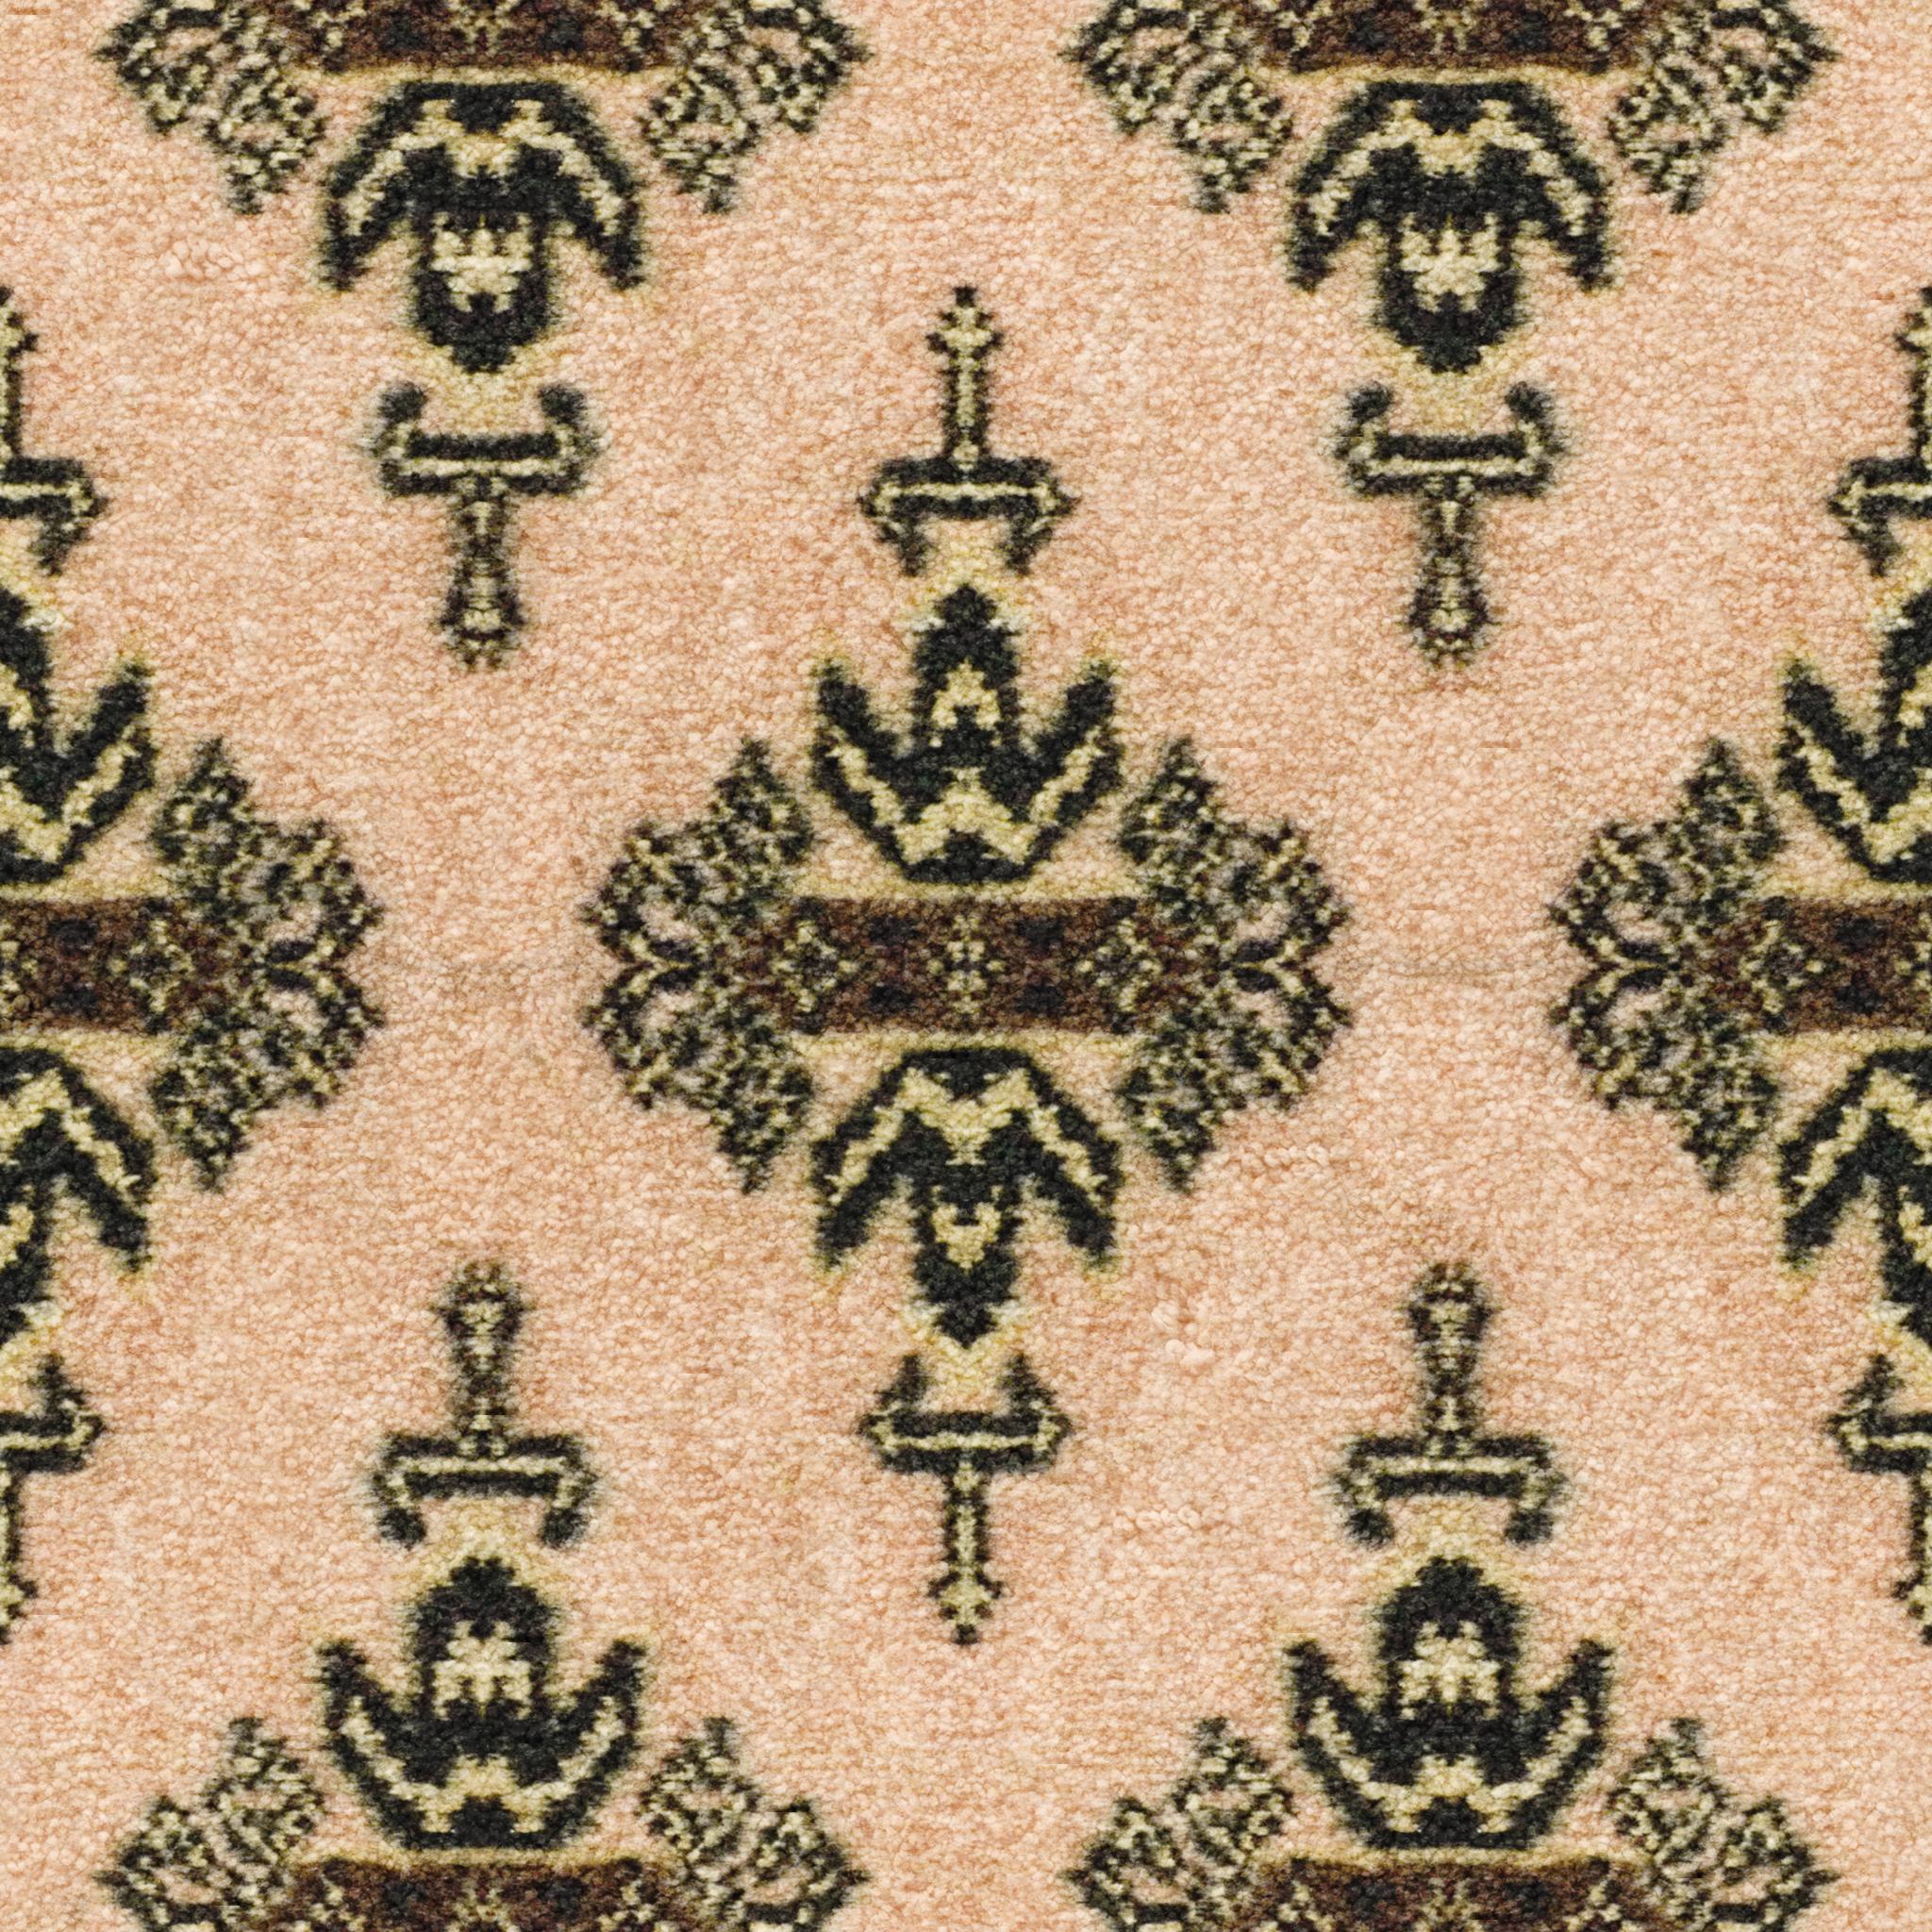 Ethnic Crown Carpet.jpg